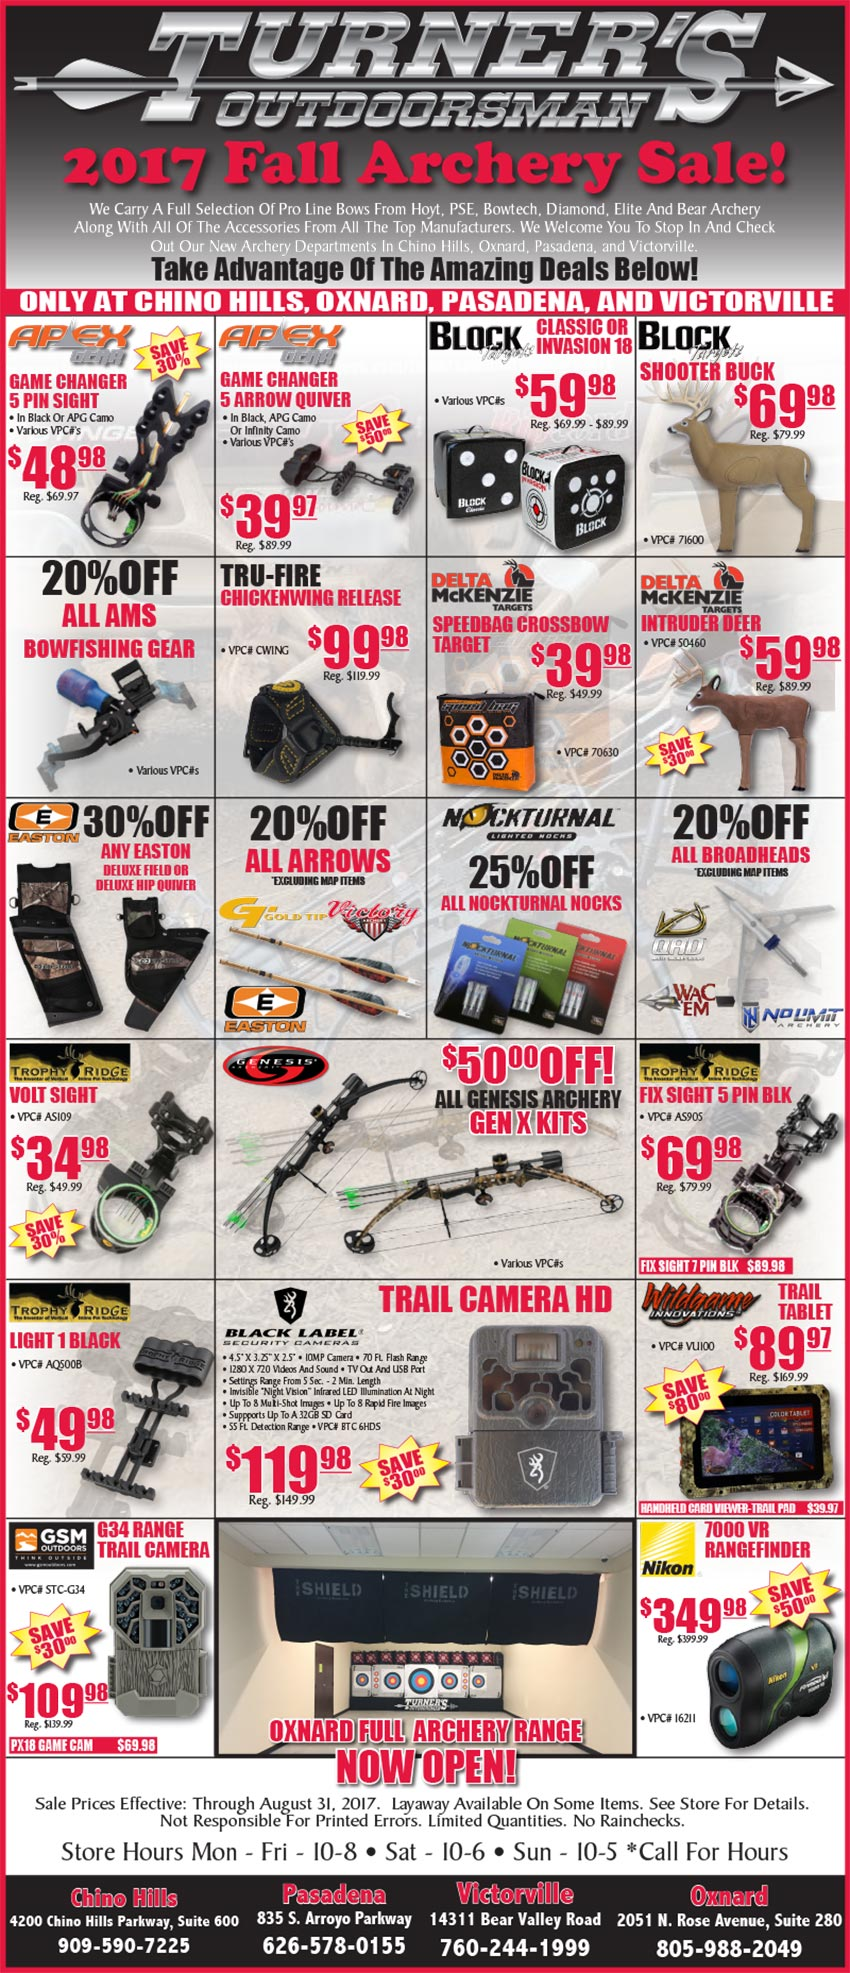 2017 Fall Archery Sale!